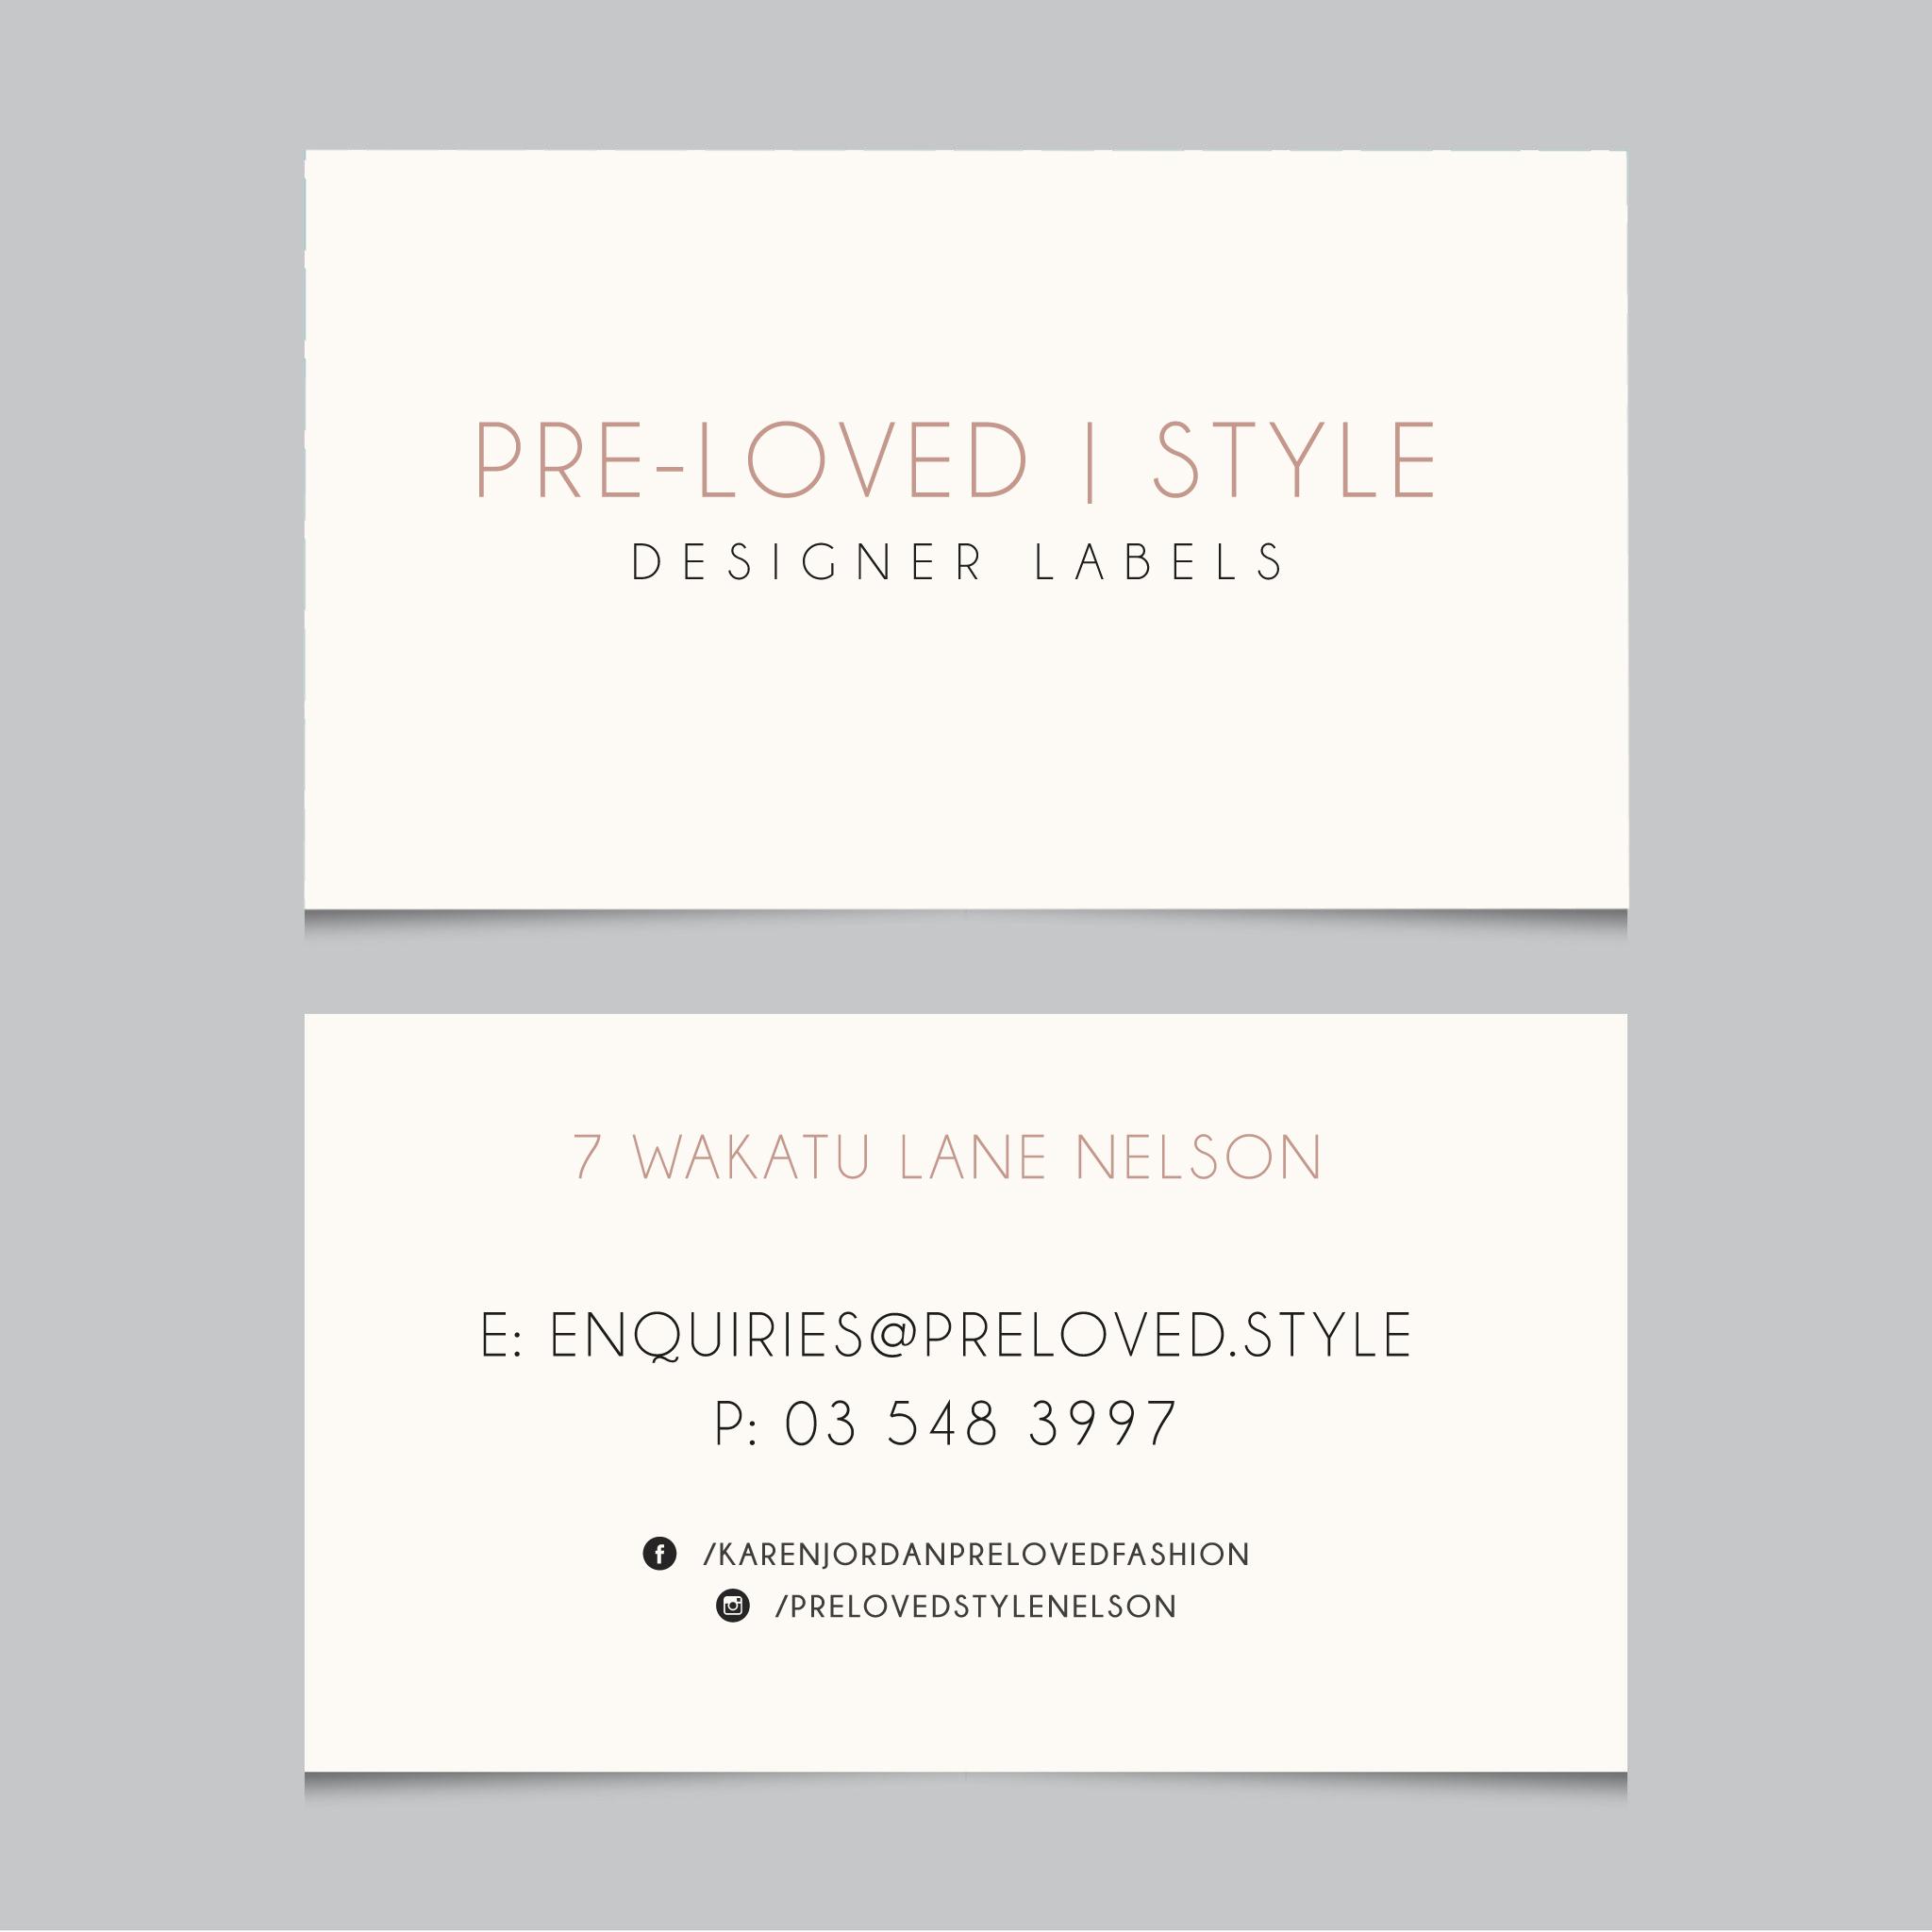 Preloved business cards.jpg